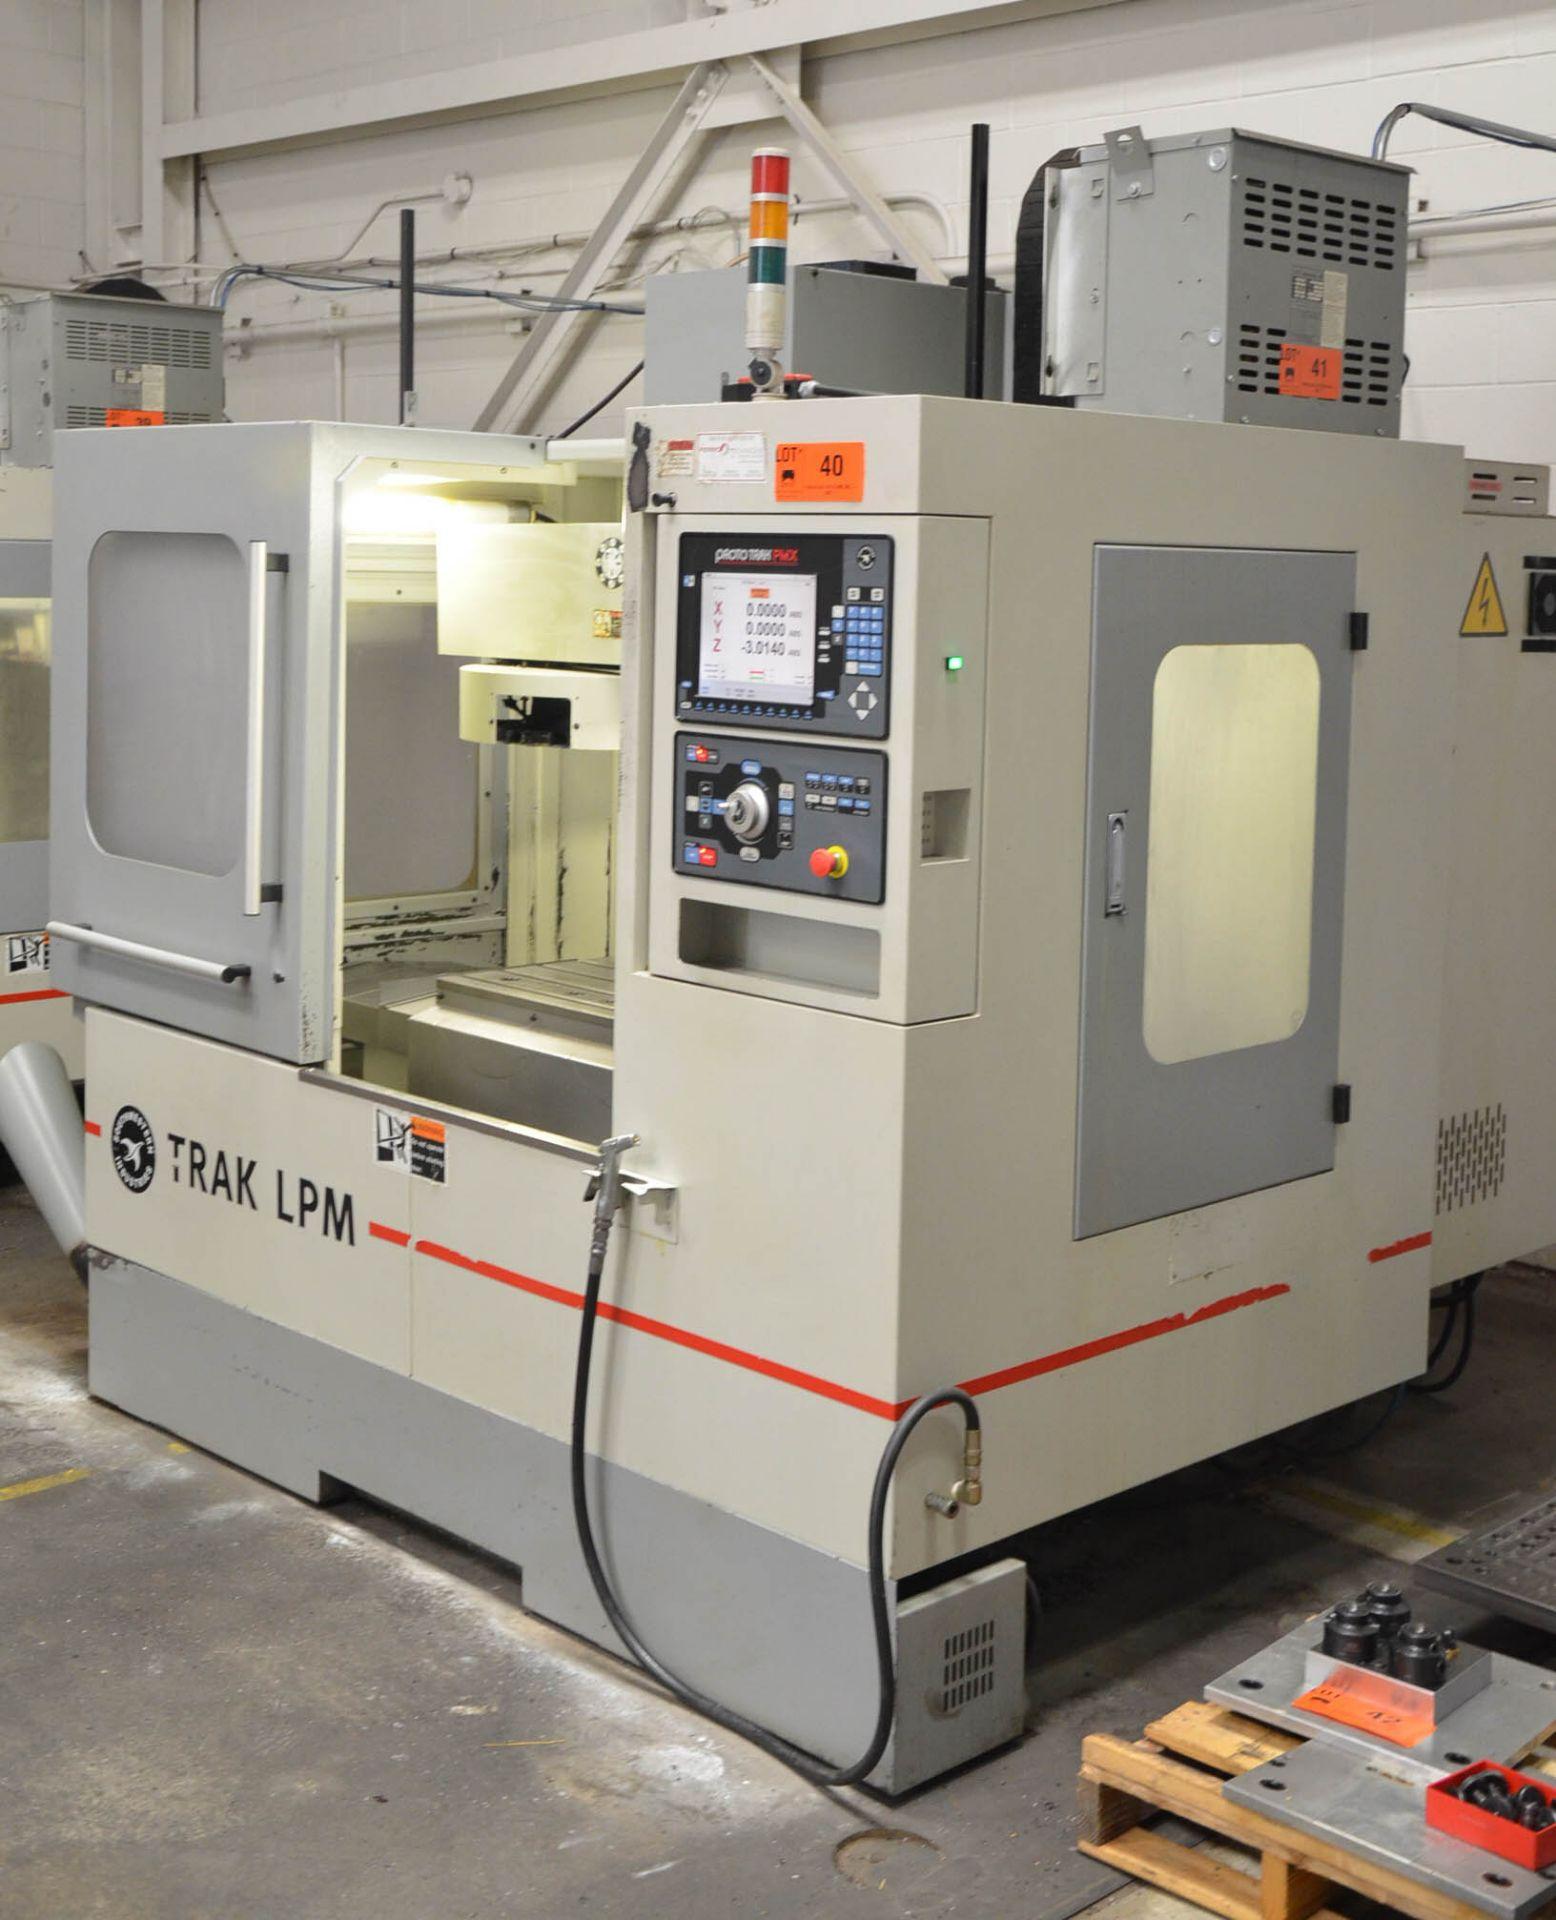 "SWI (2013) TRAK LPM CNC VERTICAL MACHINING CENTER WITH PROTO TRAK PMX CNC CONTROL, 19.5"" X 35.5"" - Image 2 of 9"